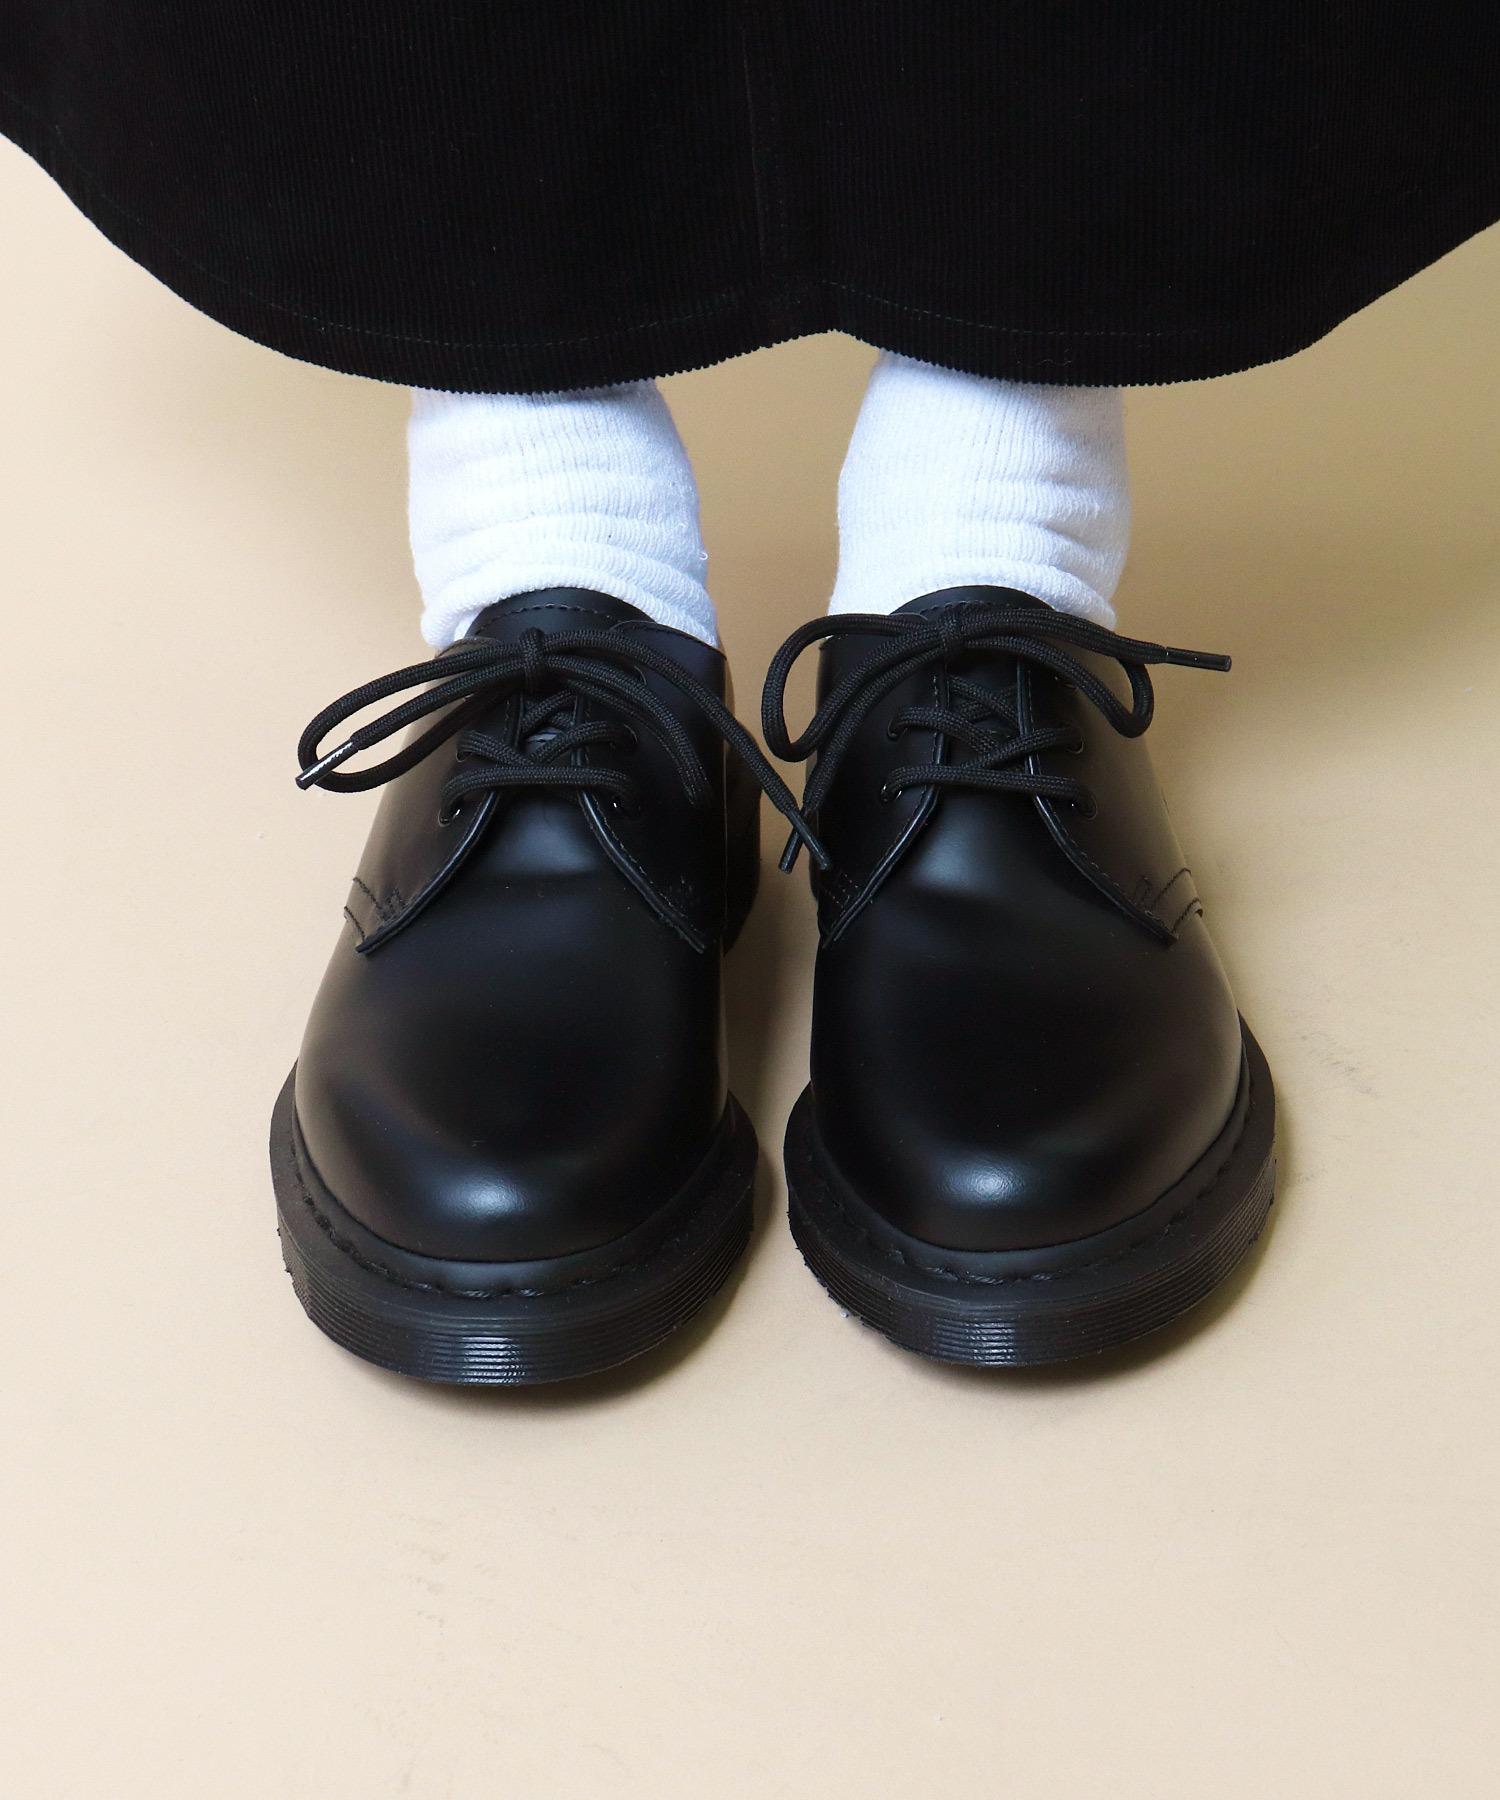 【Dr.Martens / ドクターマーチン】1461 MONO 3EYE SHOE モノトーン 3アイレット シューズ レザーシューズ 革靴 短靴 14345001